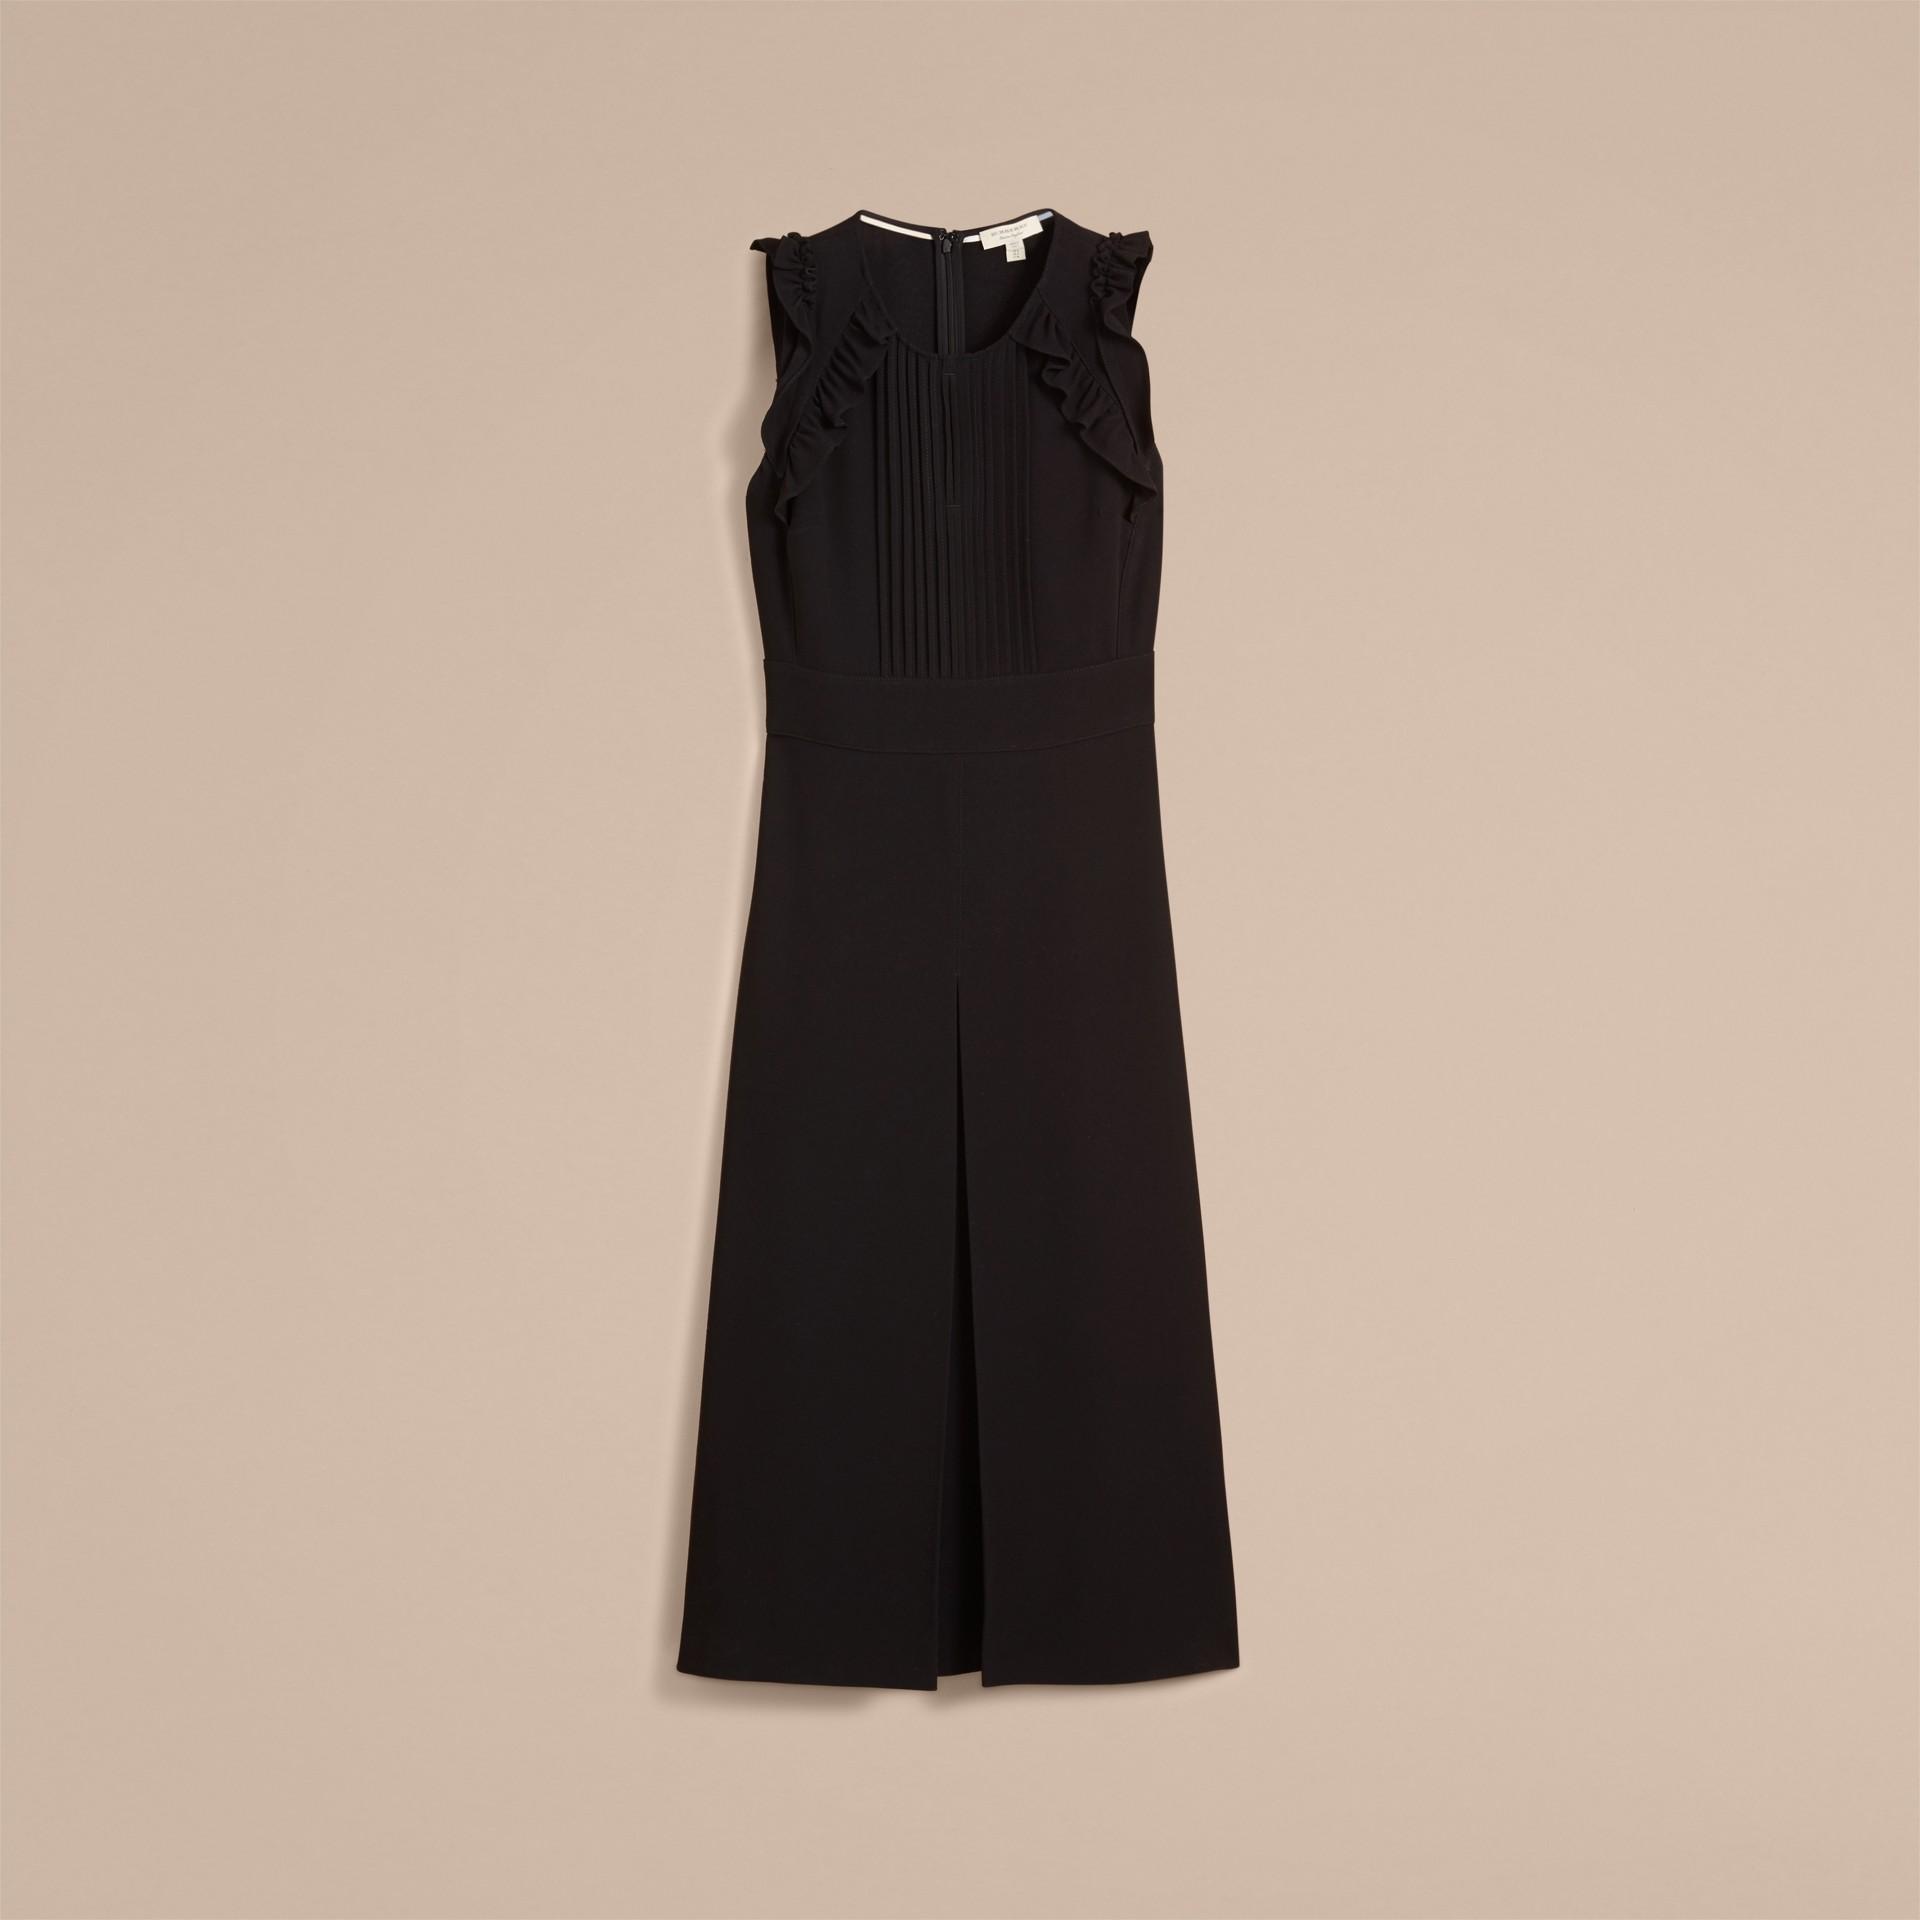 Sleeveless Ruffle Trim Crepe Dress - gallery image 4